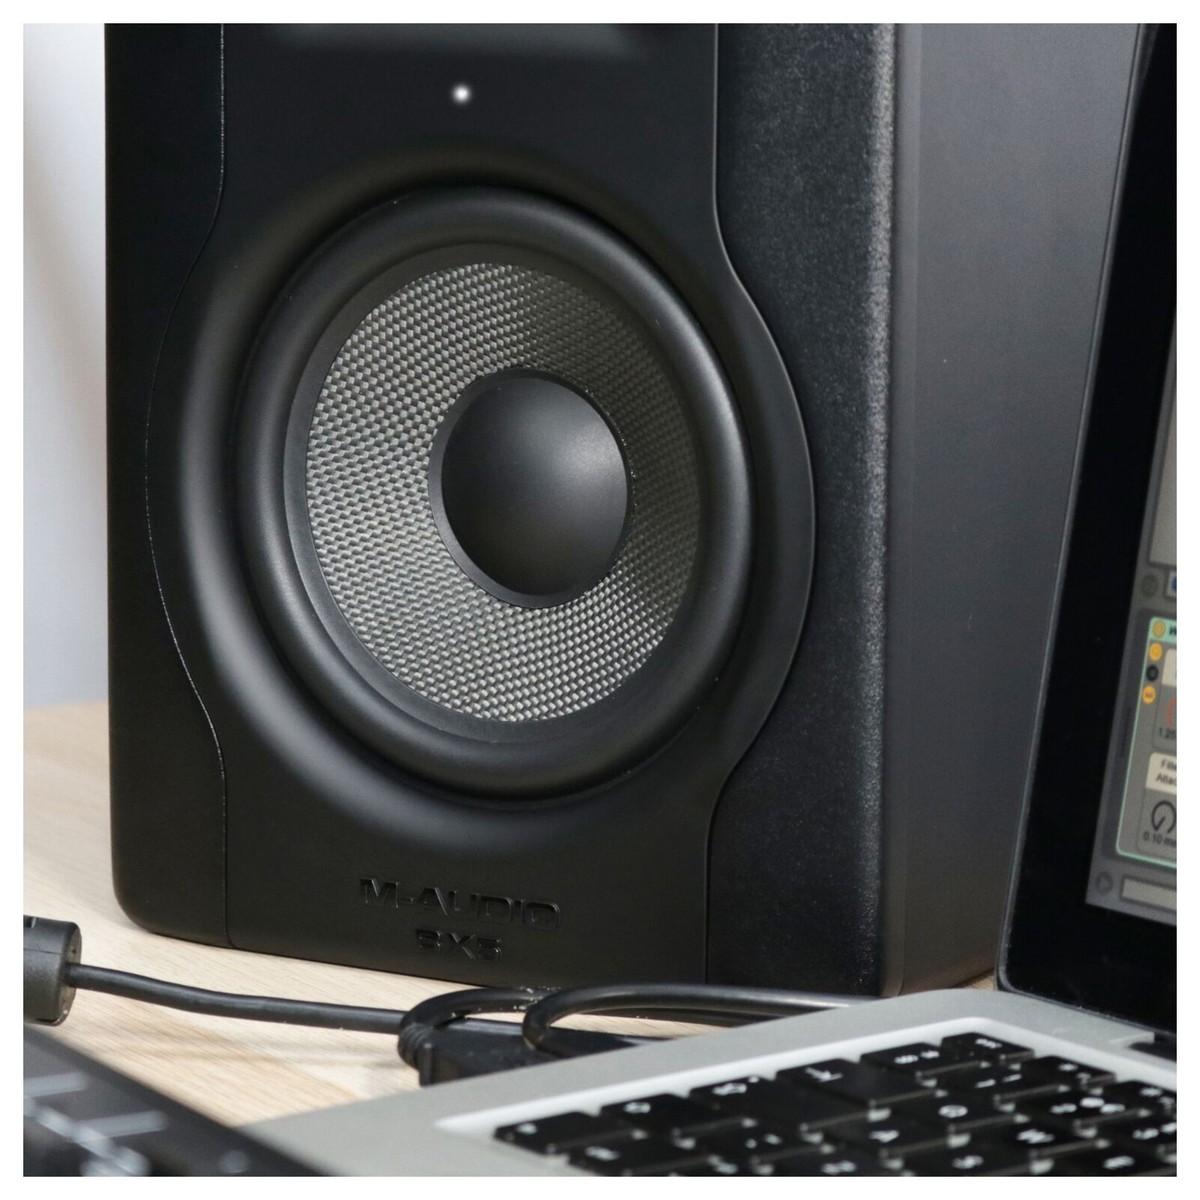 M Audio Bx5 D3 Studio Monitors Pair At Gear4music Fender Roland Ready Strat Wiring Diagram Loading Zoom